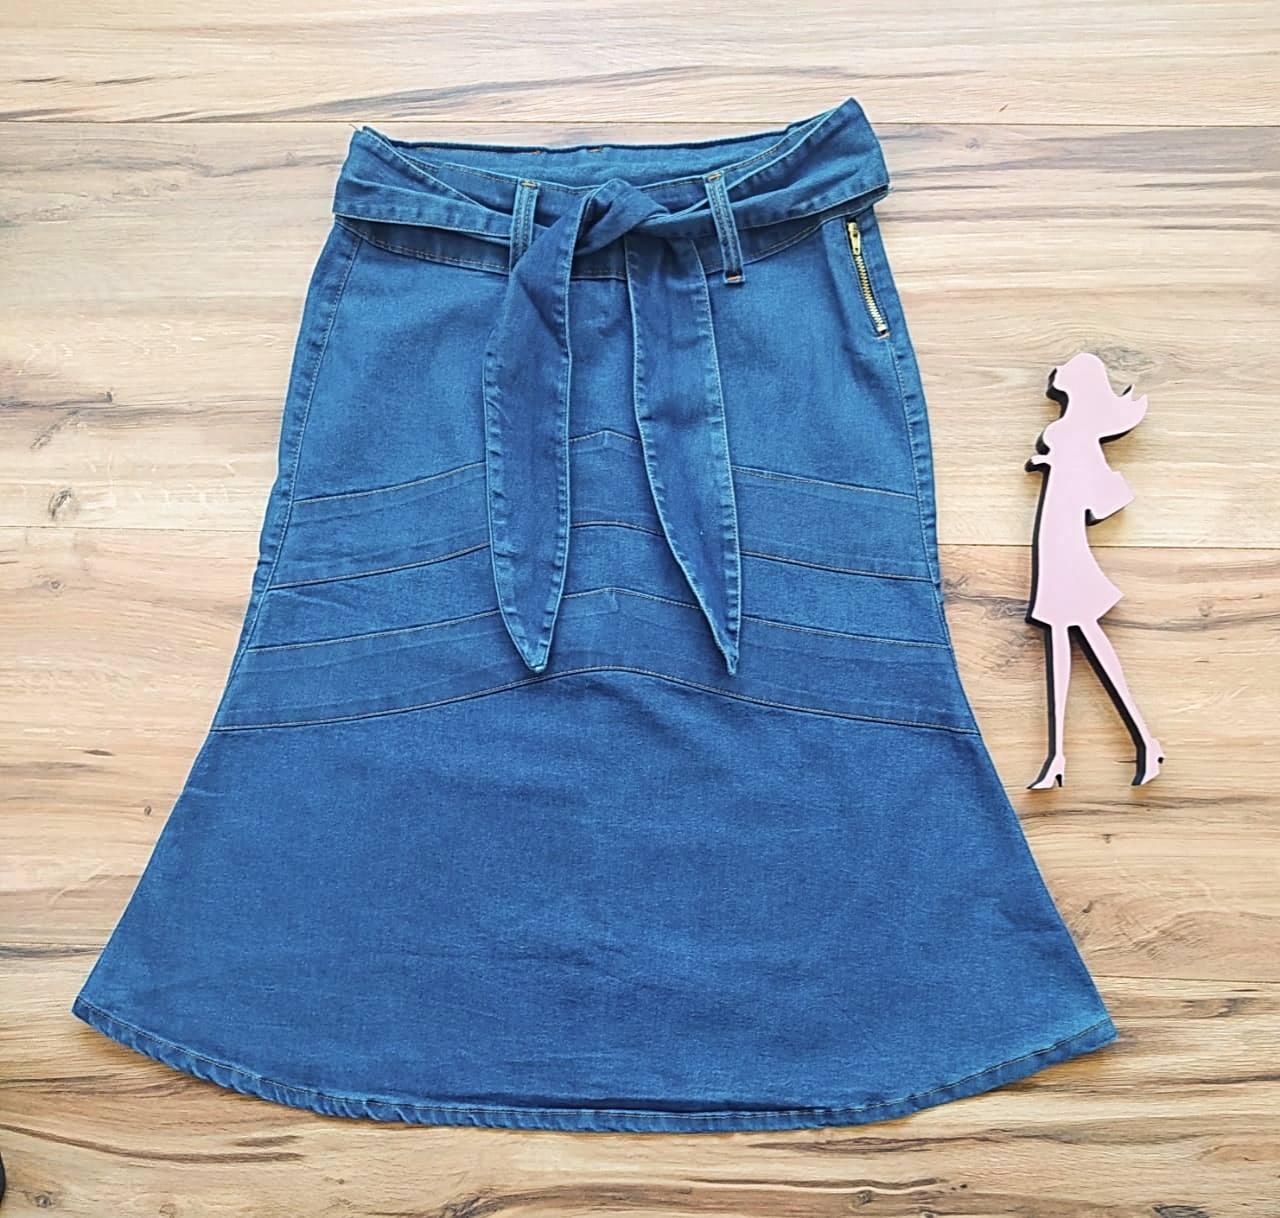 Saia Jeans Samantha SB1723 Azul Escuro